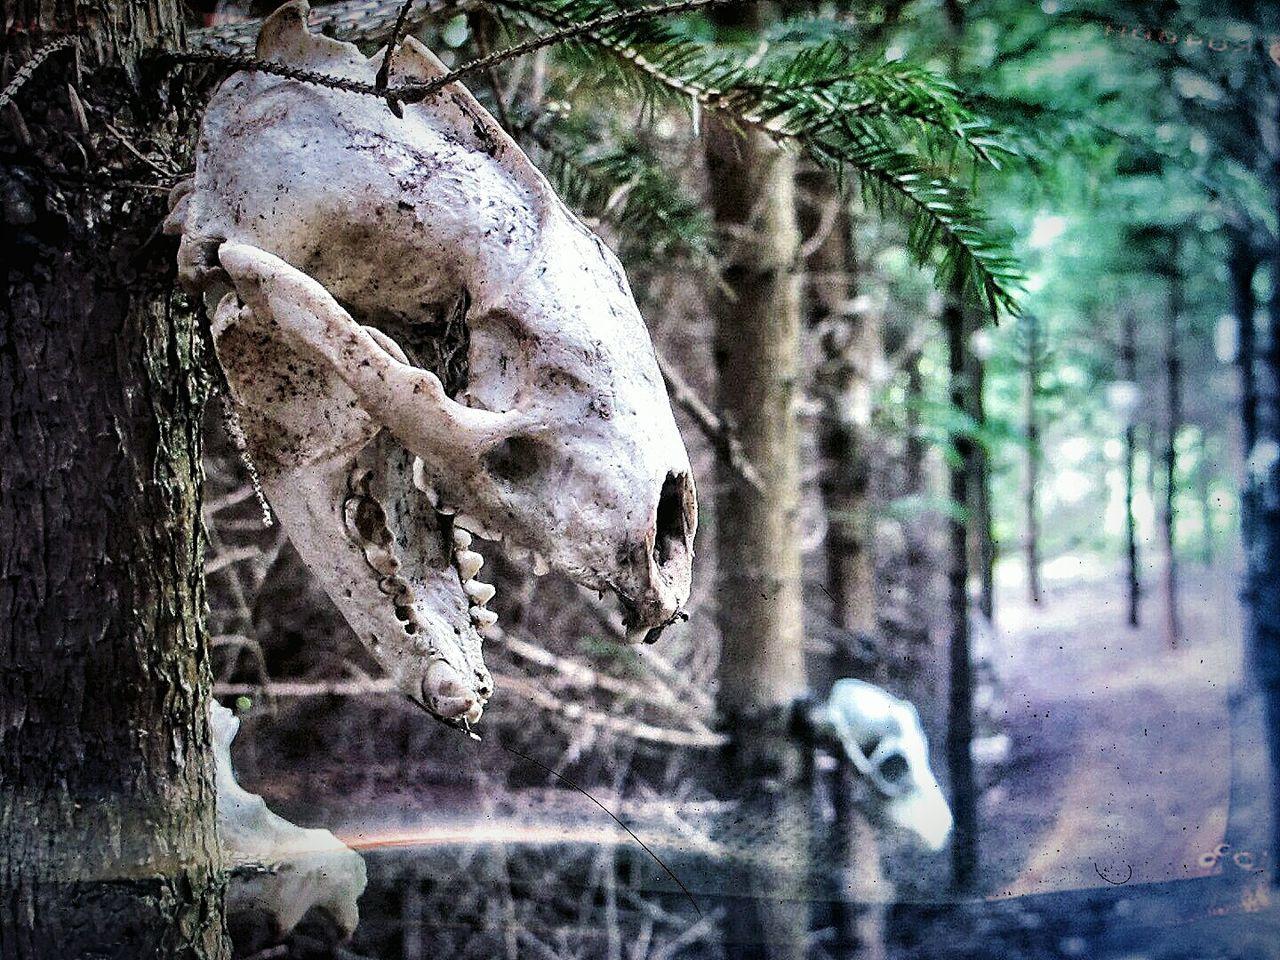 Close-Up Of Skull On Tree Trunk